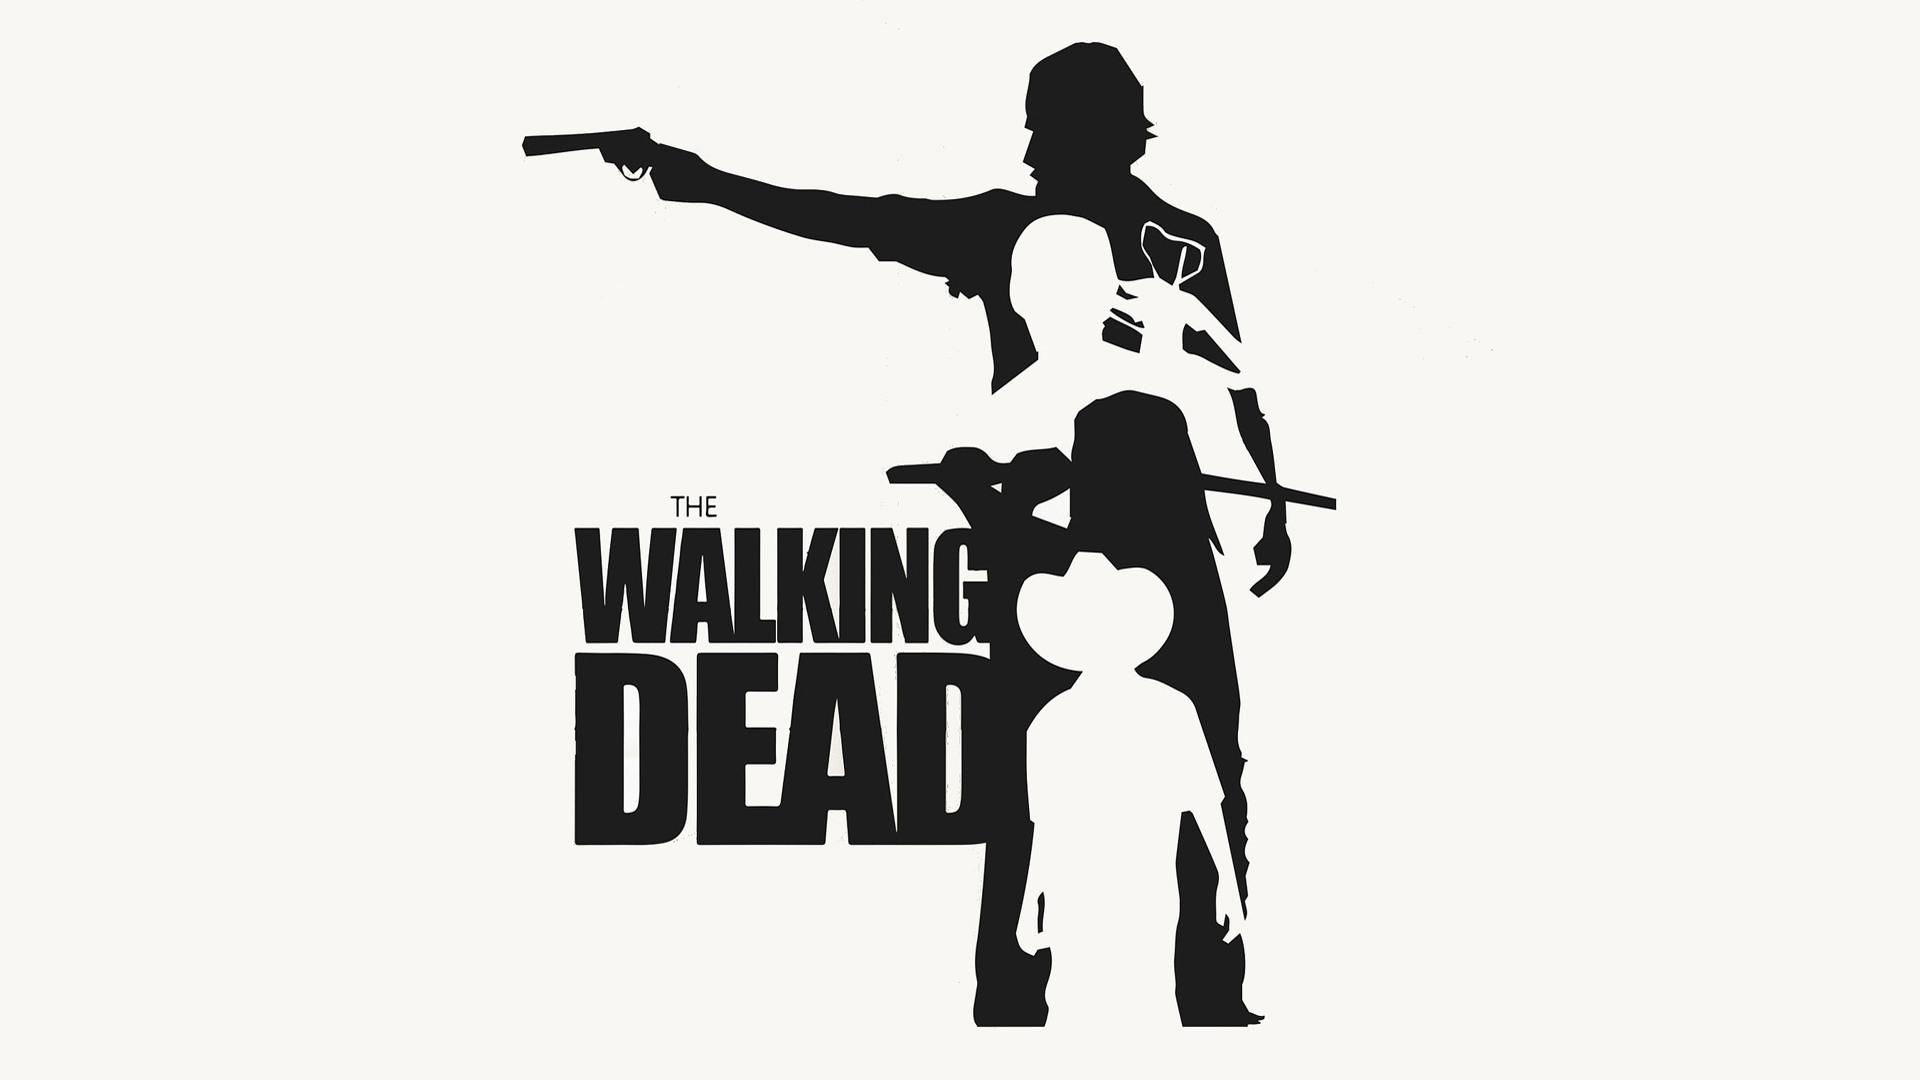 1920x1080 The Walking Dead Tv Series Art Wallpaper